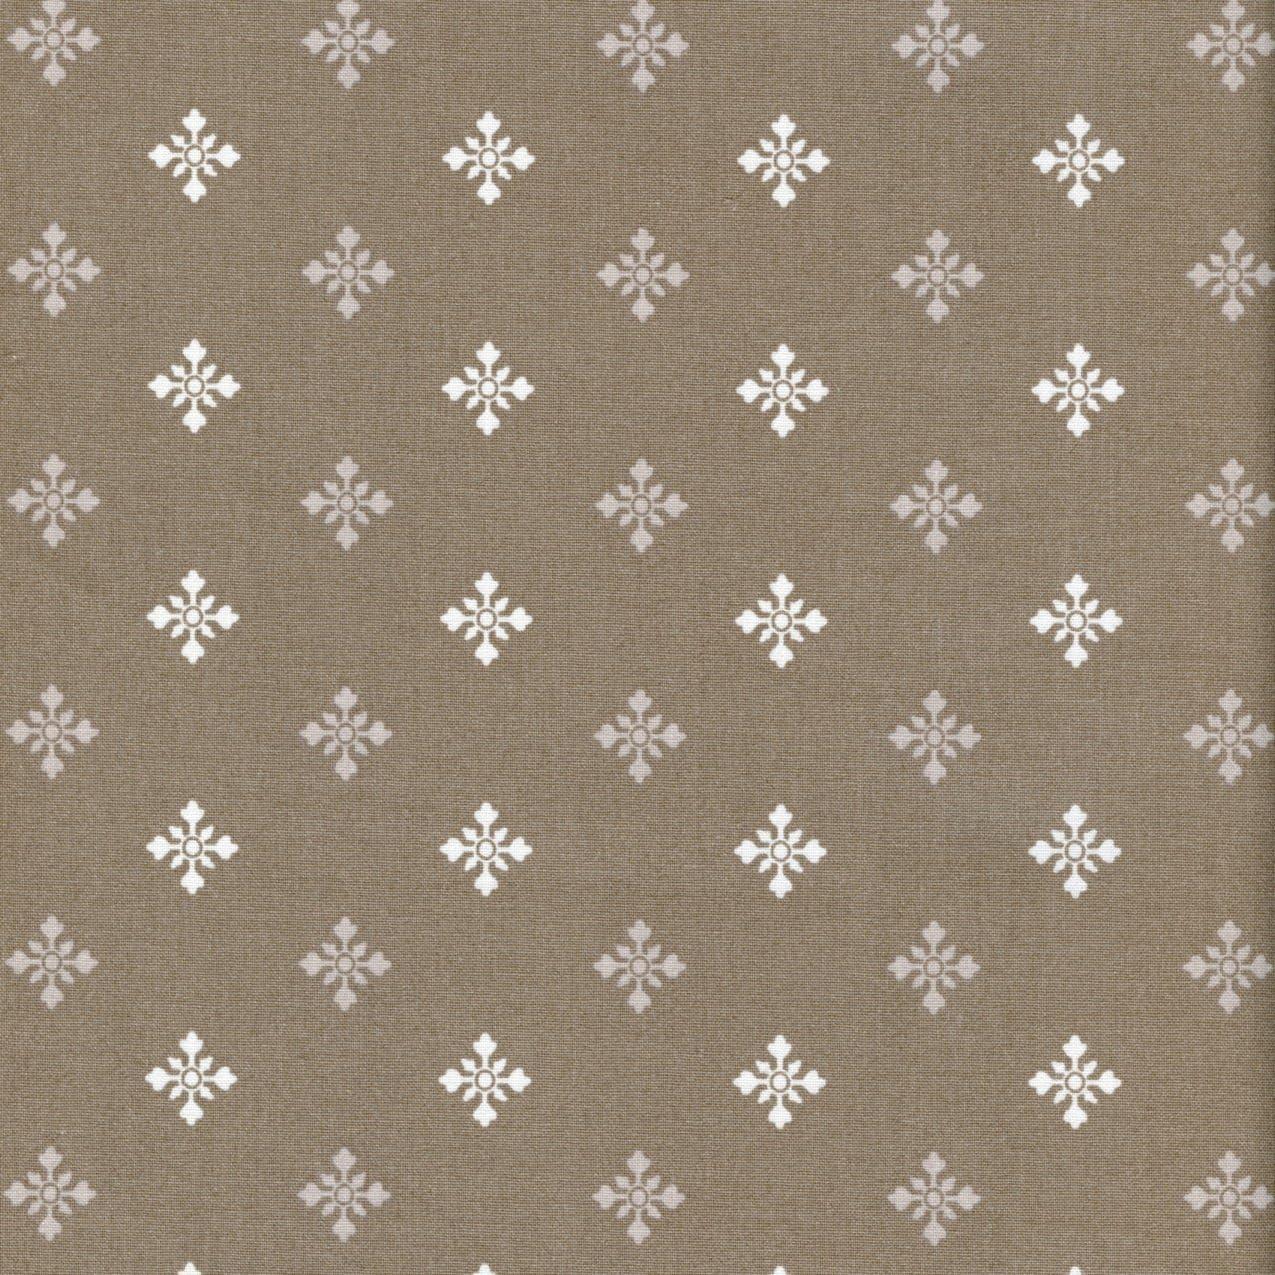 Hearts /& Snowflakes Textiles français French Christmas Fabric Ecru Alpine